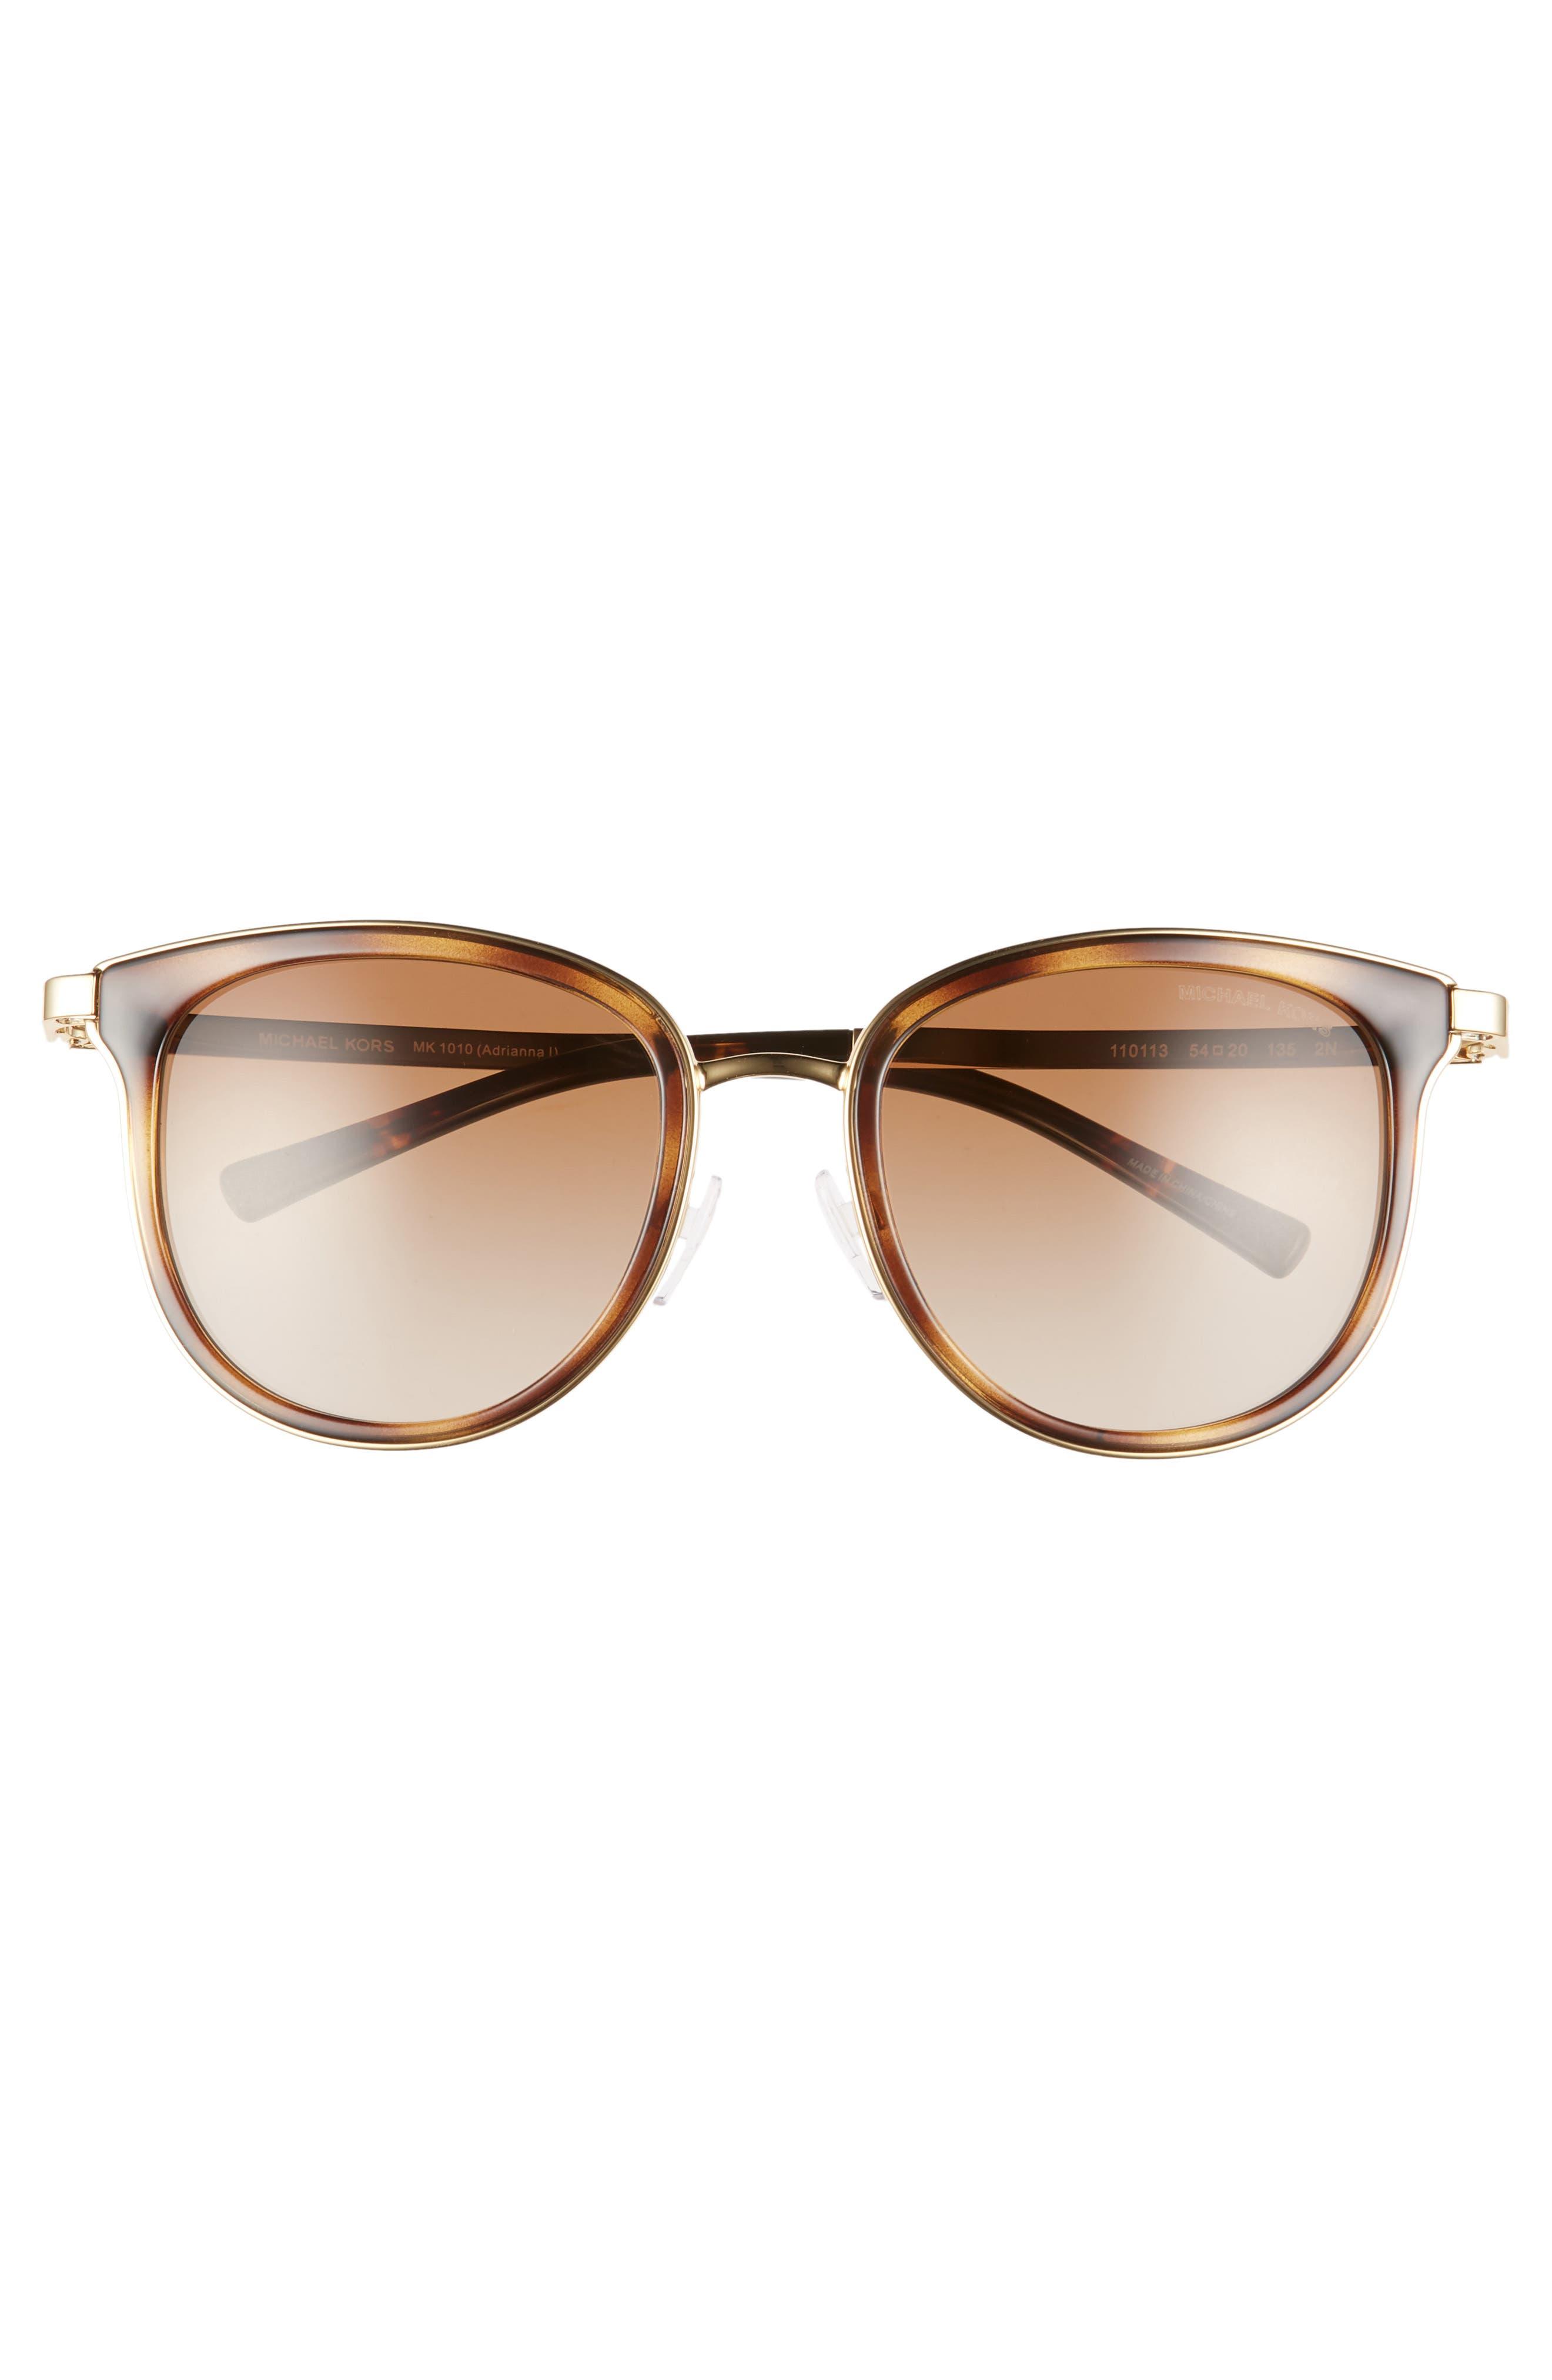 54mm Round Sunglasses,                             Alternate thumbnail 3, color,                             200